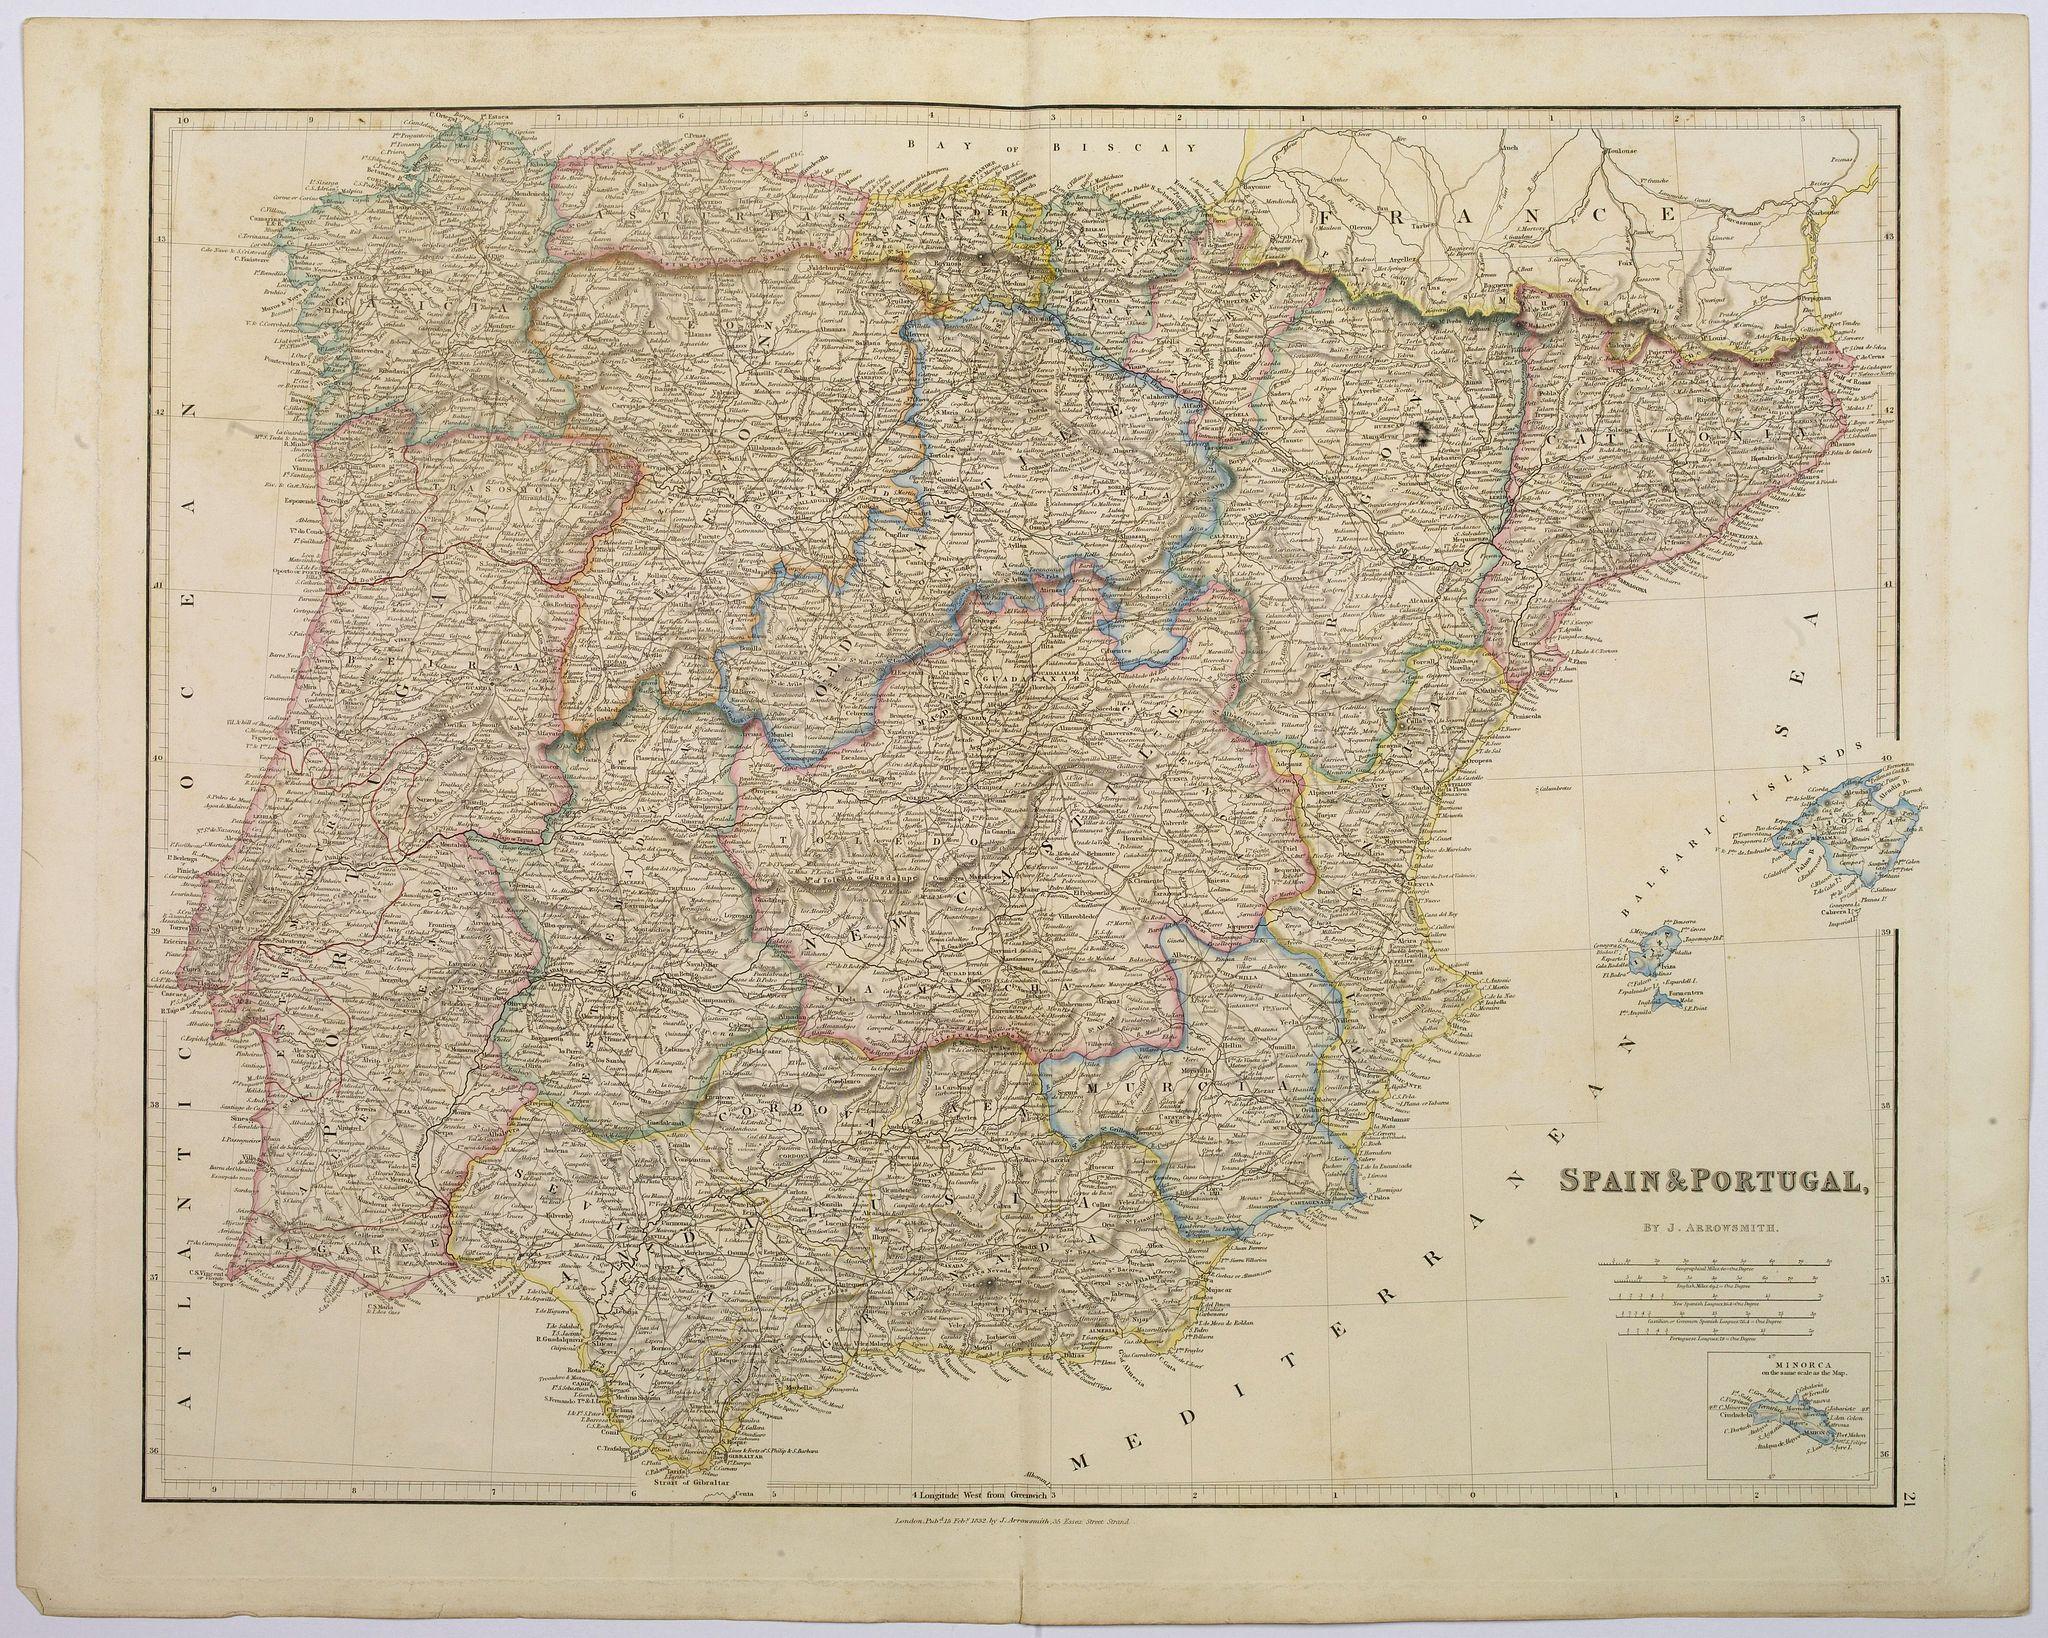 ARROWSMITH, John -  Spain & Portugal.